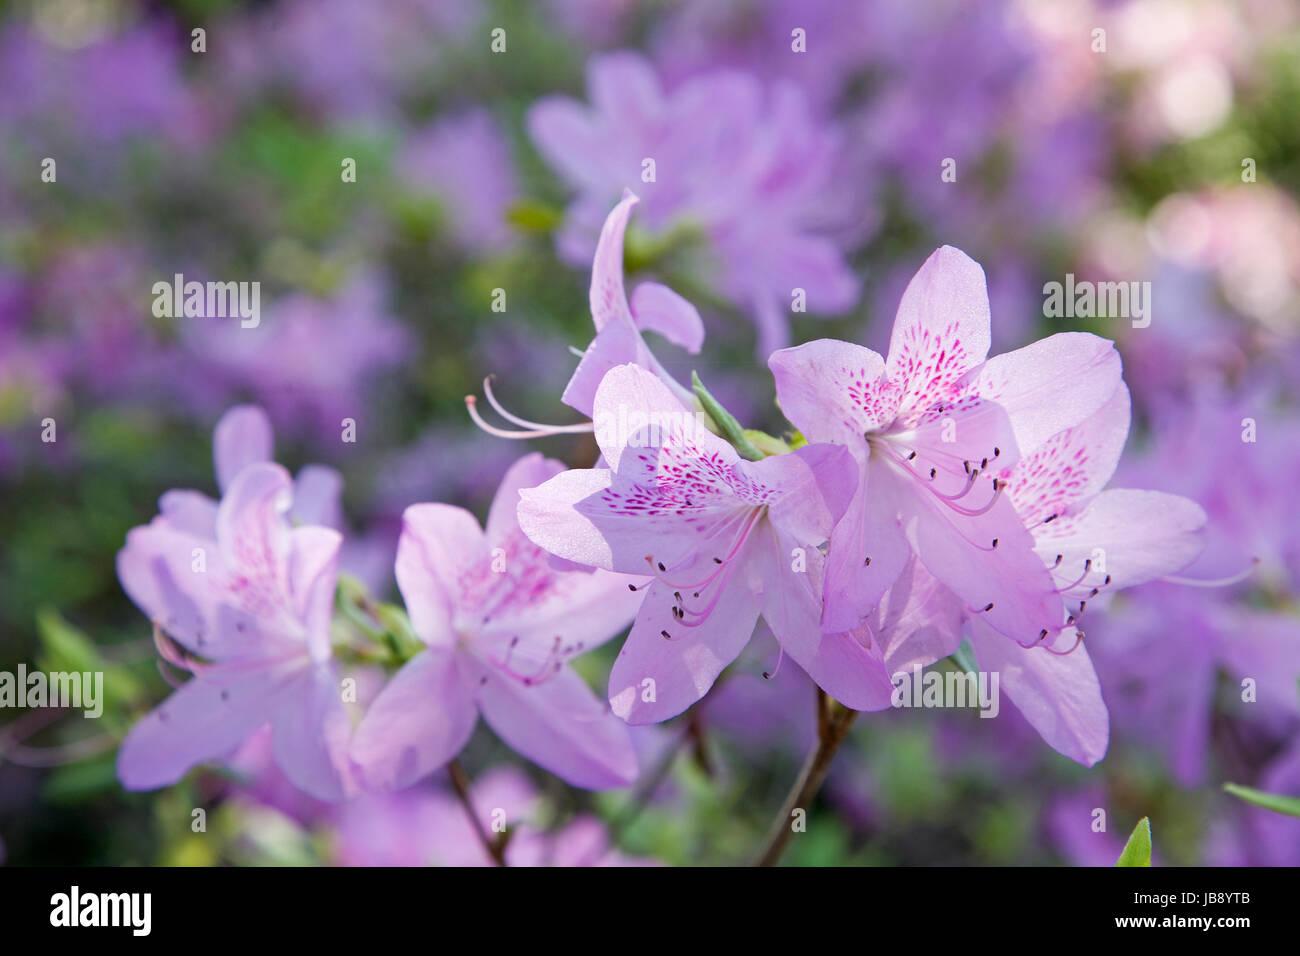 Spring Blooms At The Dallas Arboretum - Stock Image